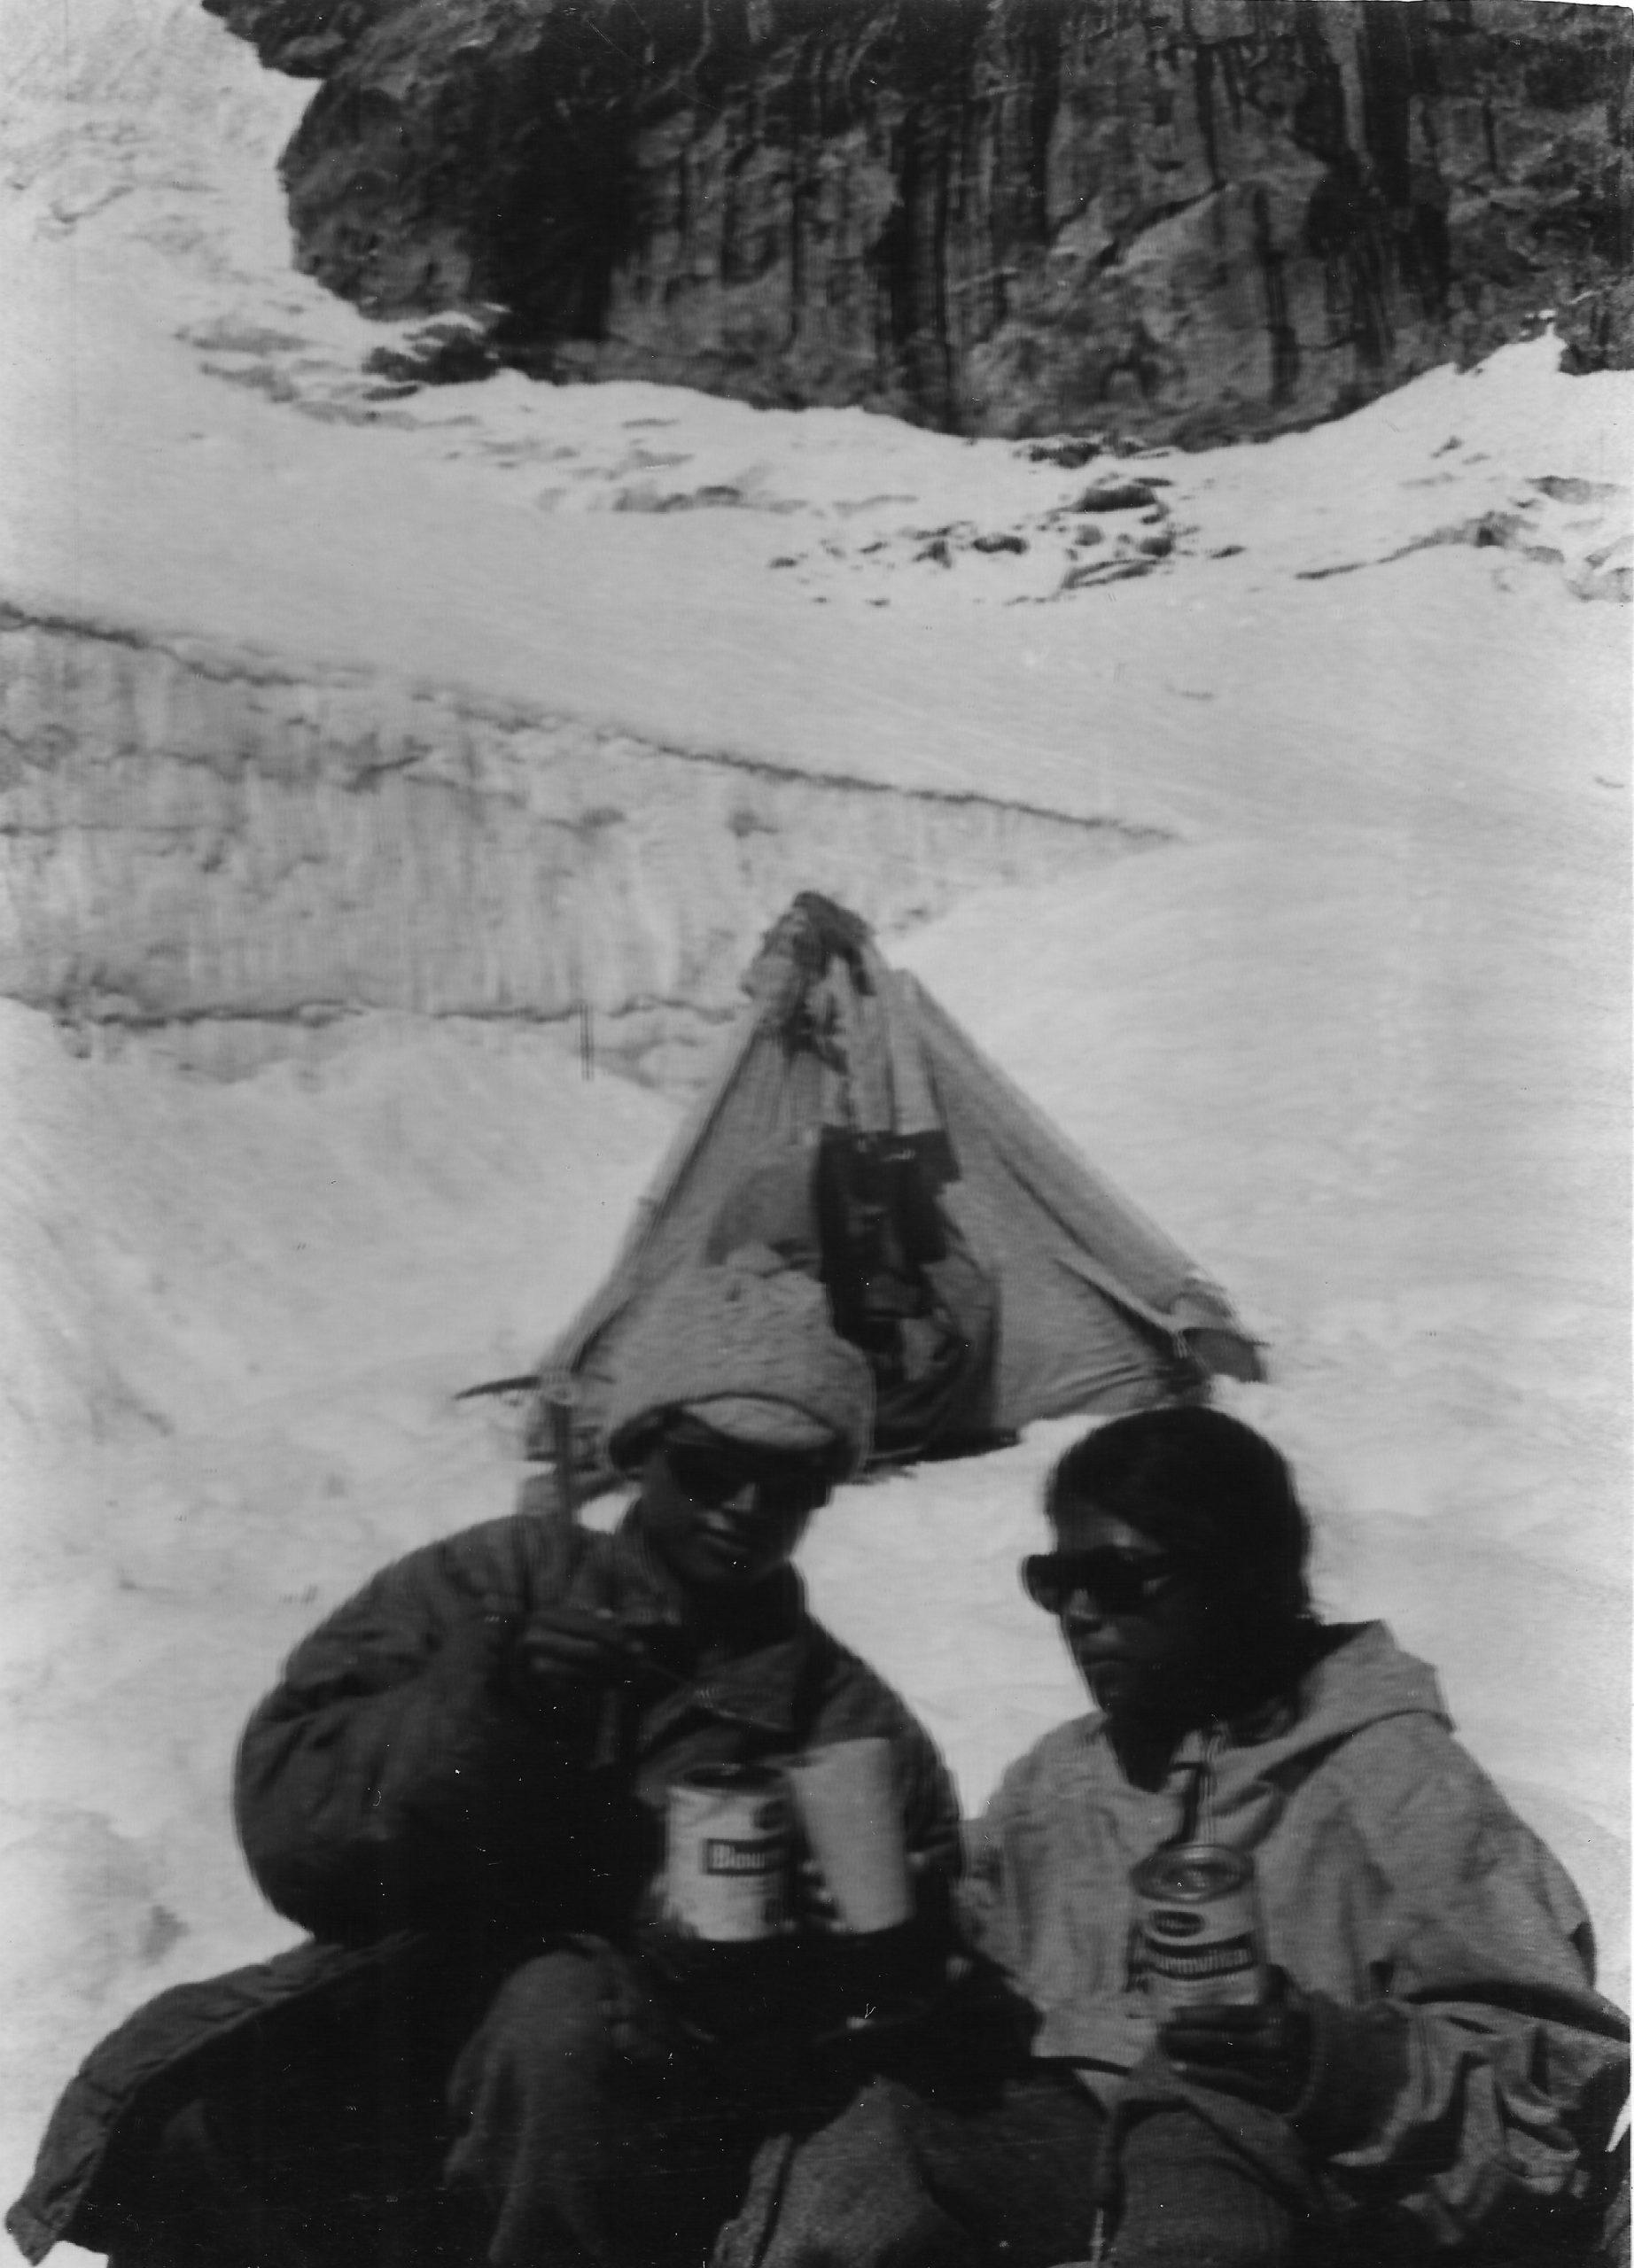 Enjoying tea at camp III, 18,000 feet, with Kamala (left) and Sudipta (right) [image by: Sudipta Sengupta]